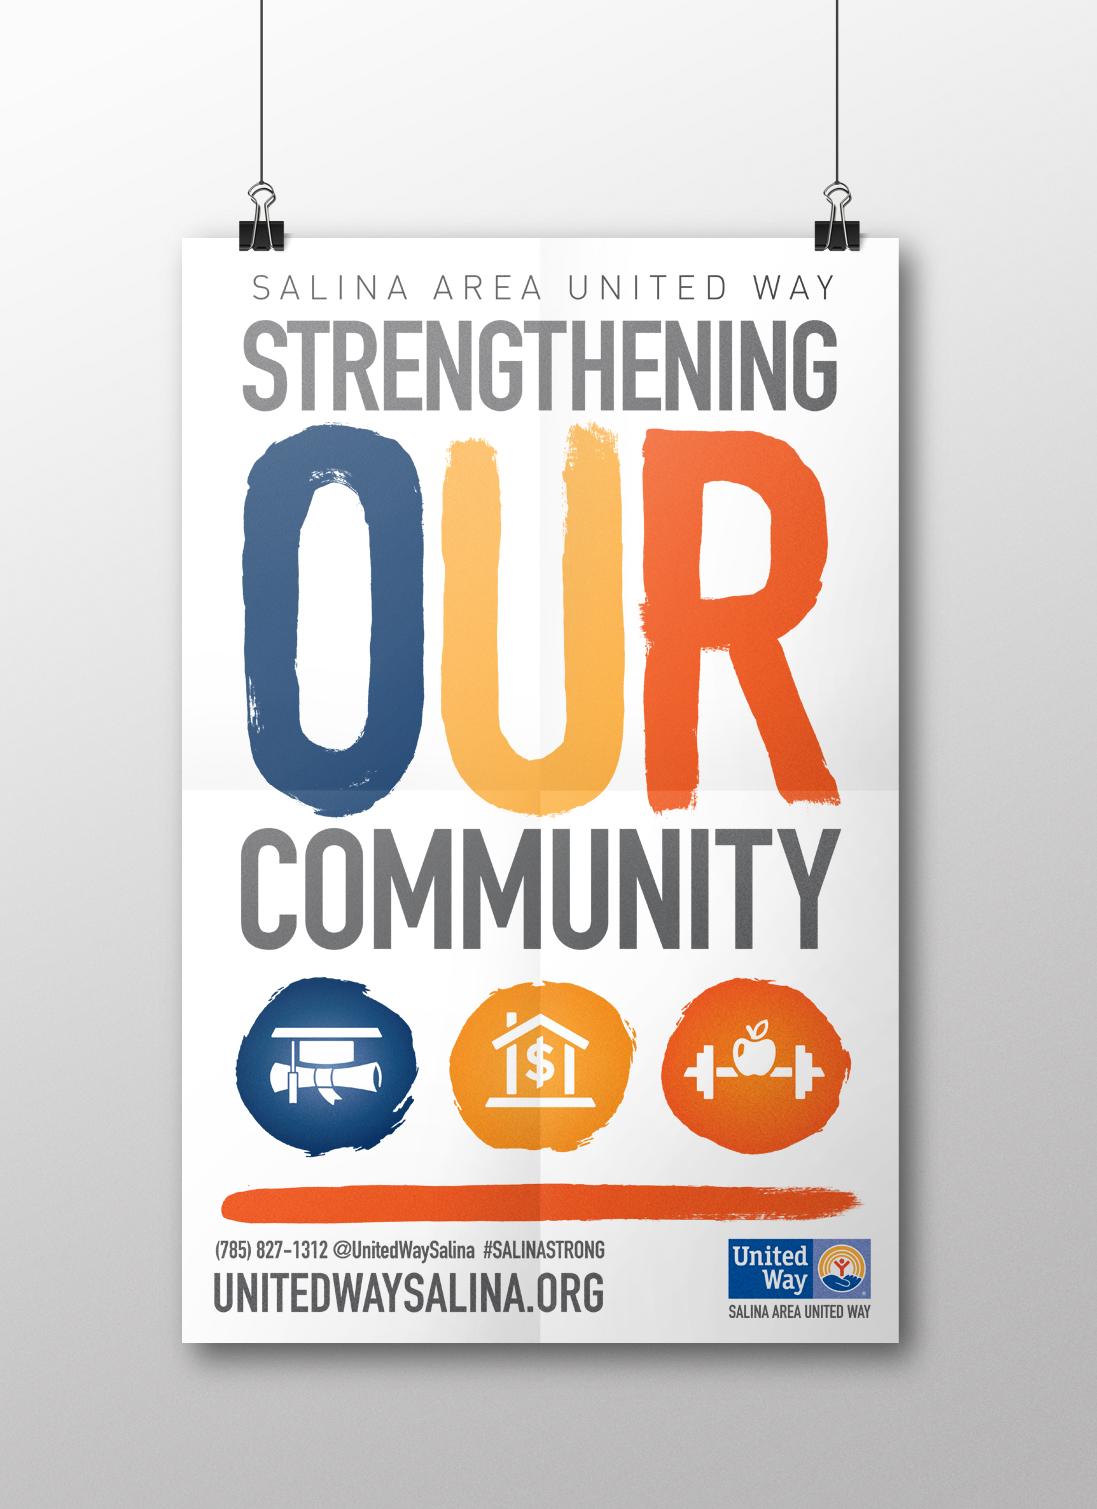 Mr. Freeland Design Salina Area United Way Campaign Artwork for 2015